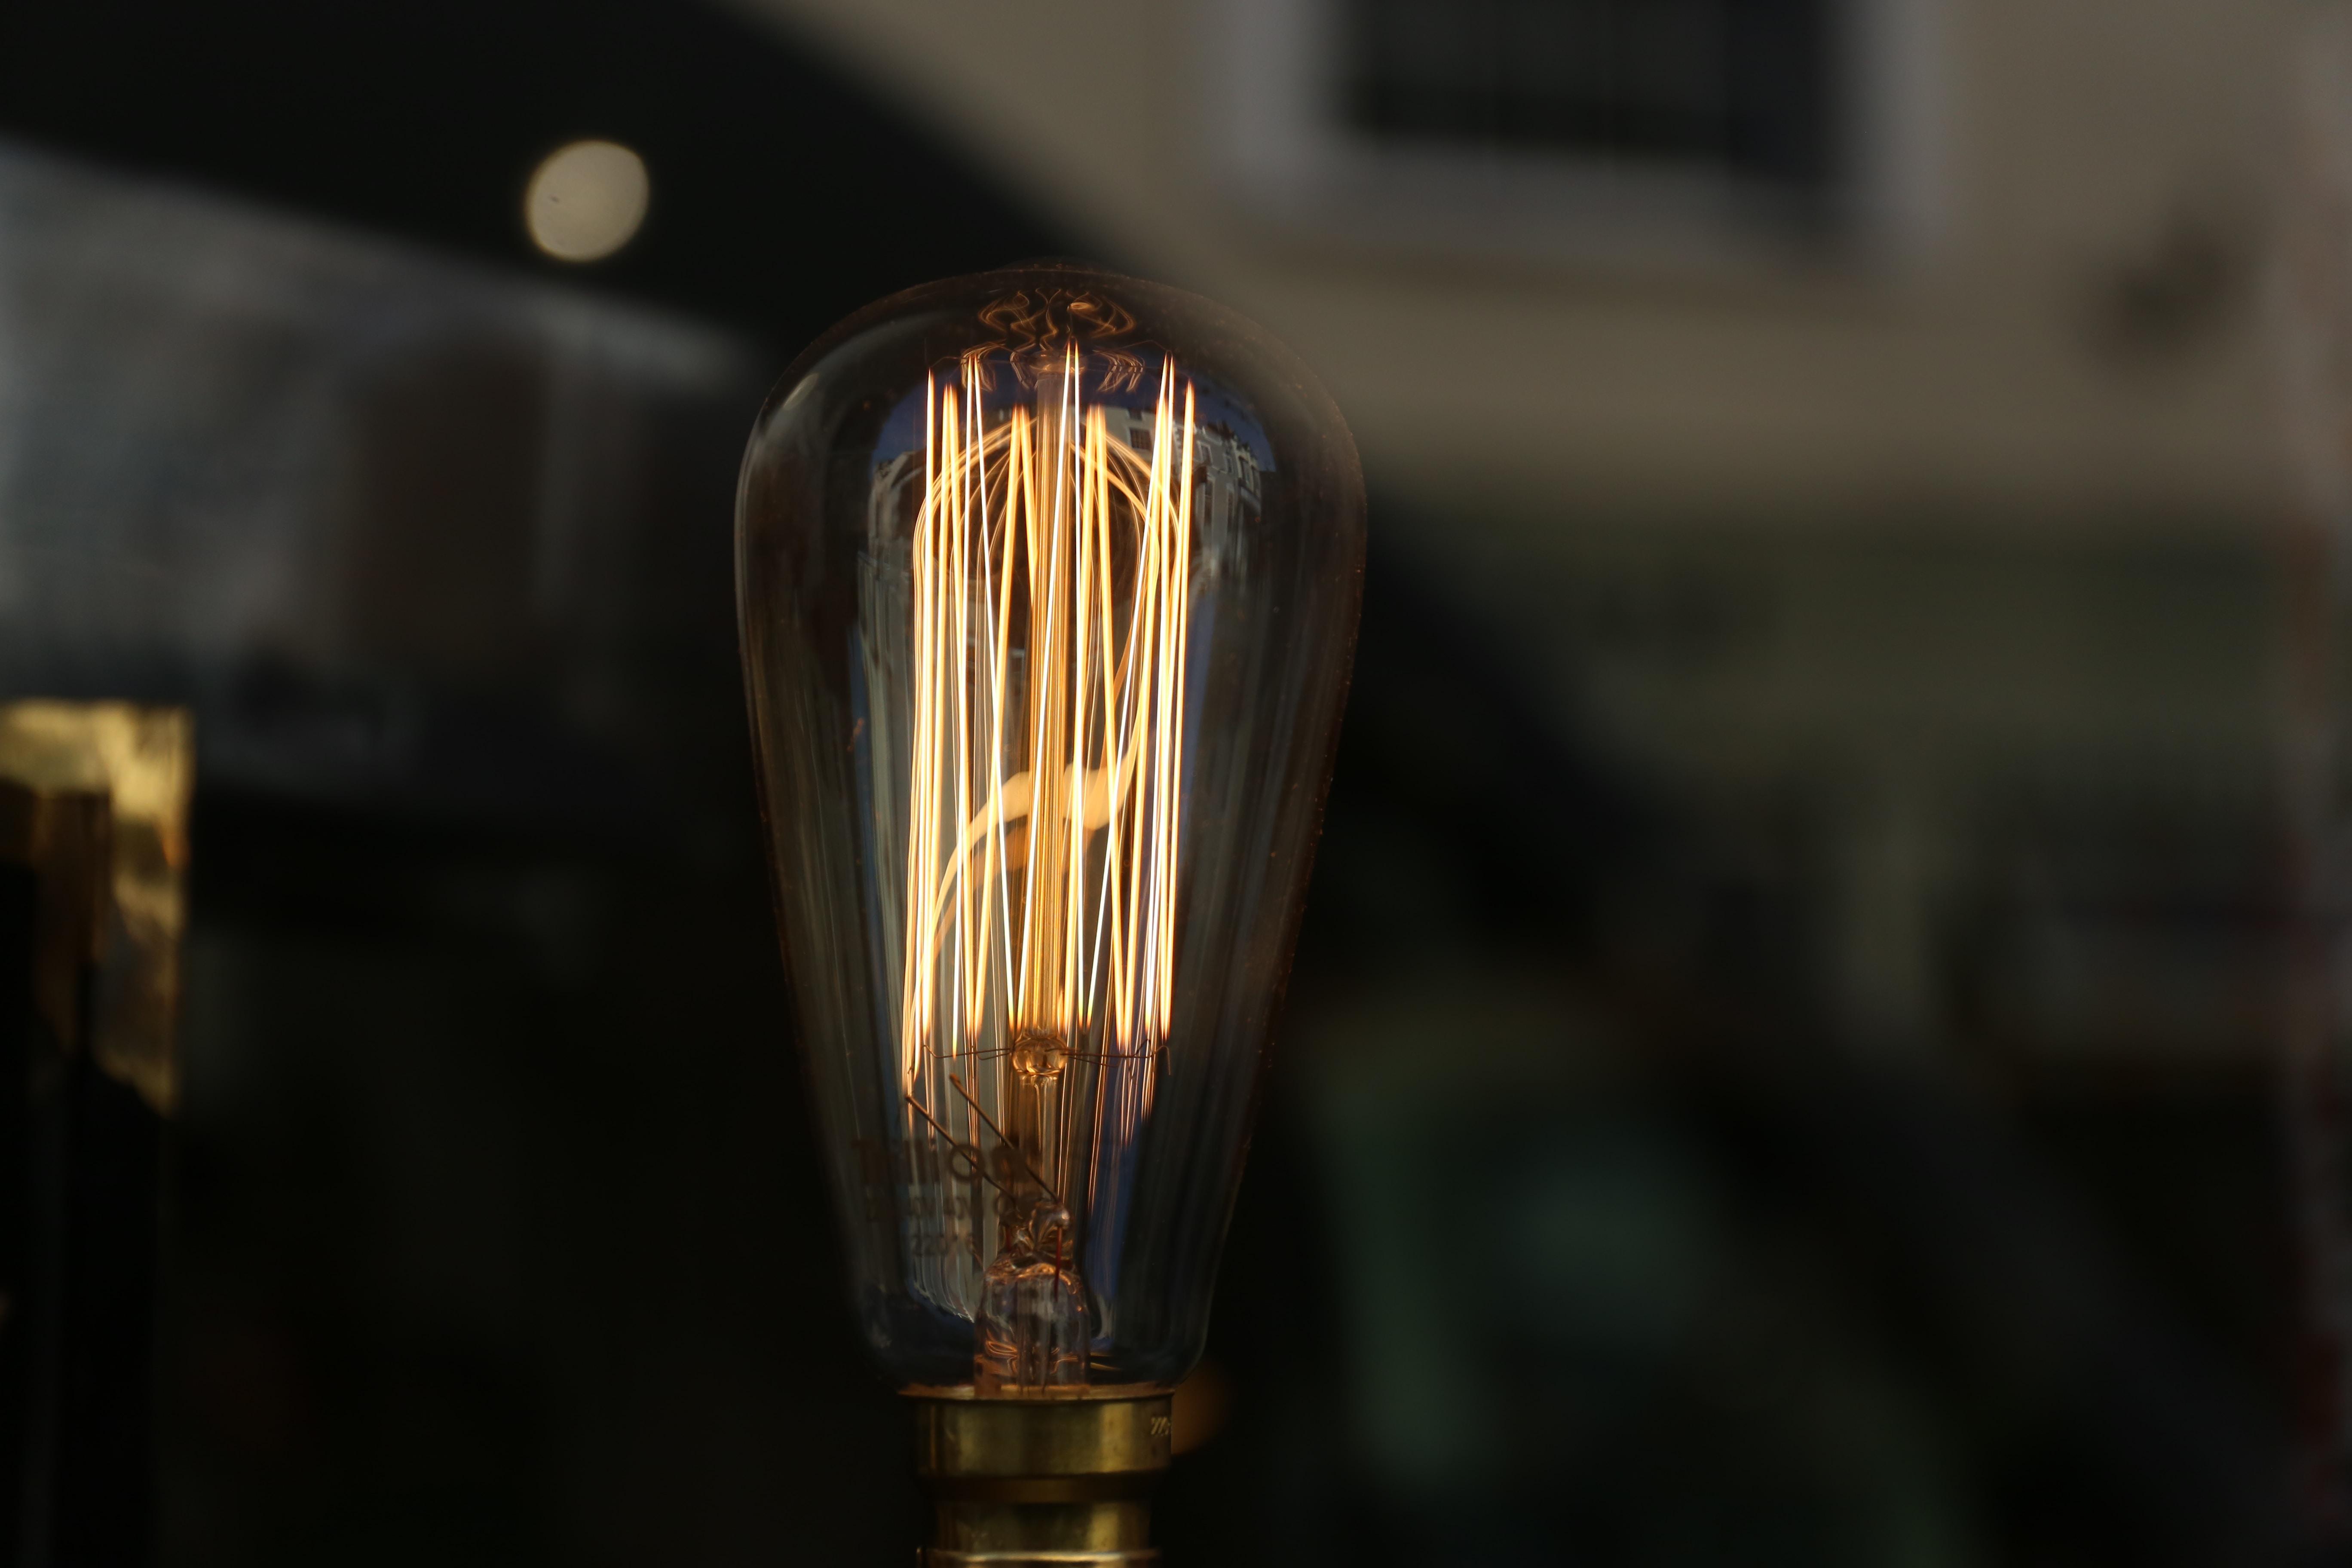 incandescent bulb turned off